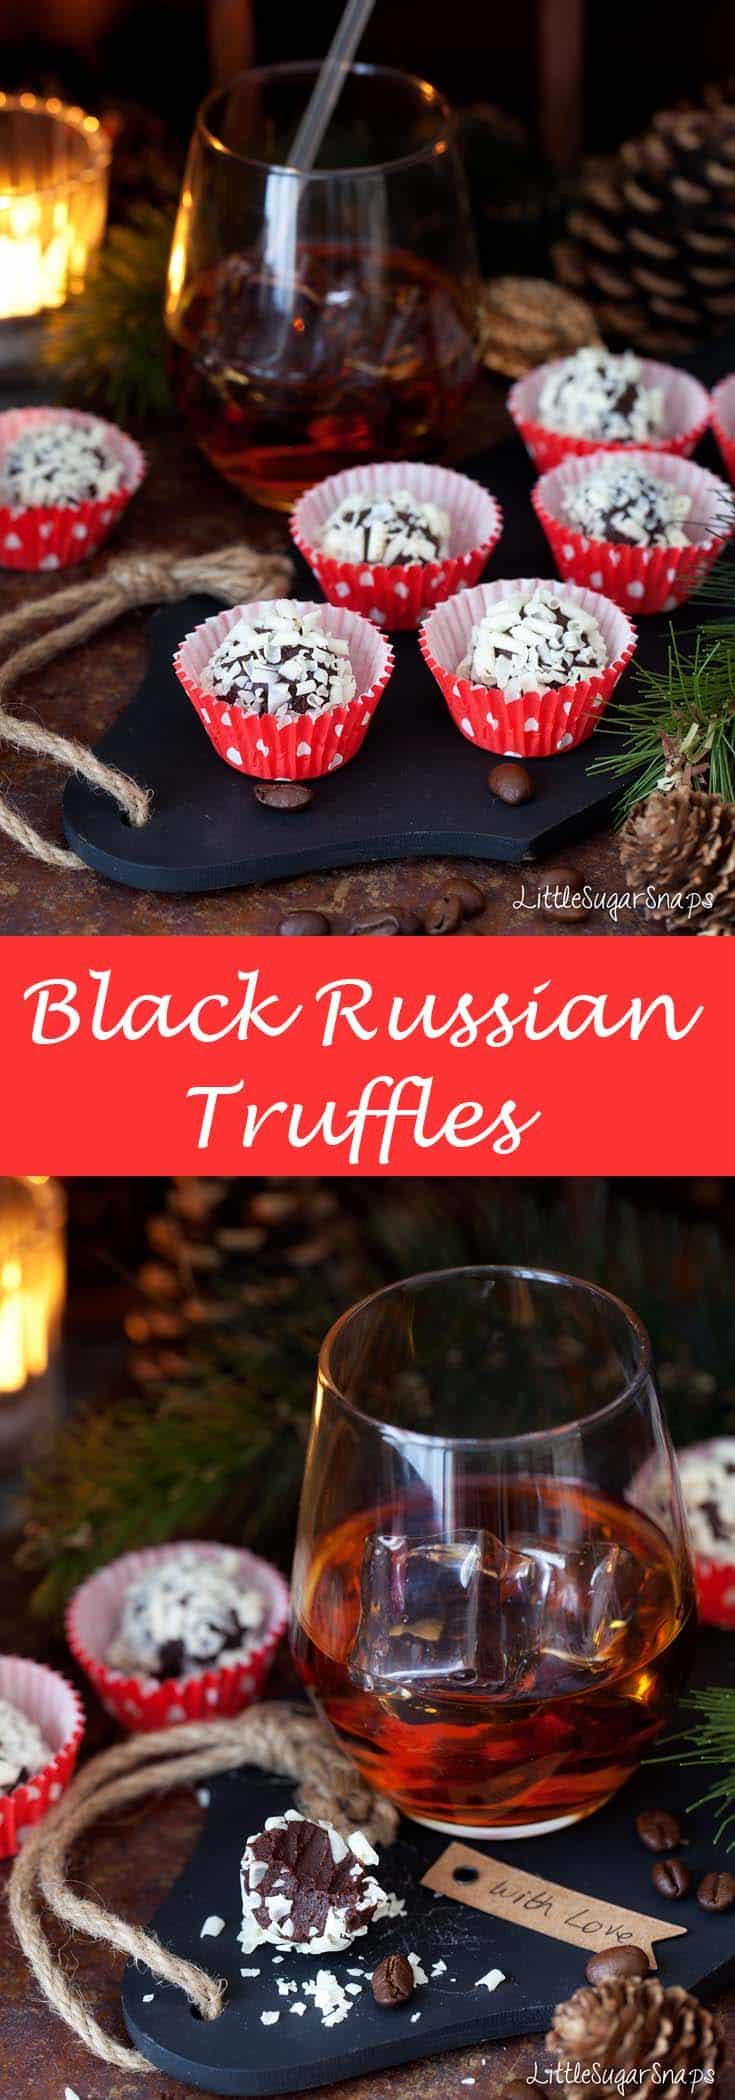 Black Russian Truffles #blackrussian #coffeetruffles #boozytruffles #cocktailtruffles #kahluatruffles